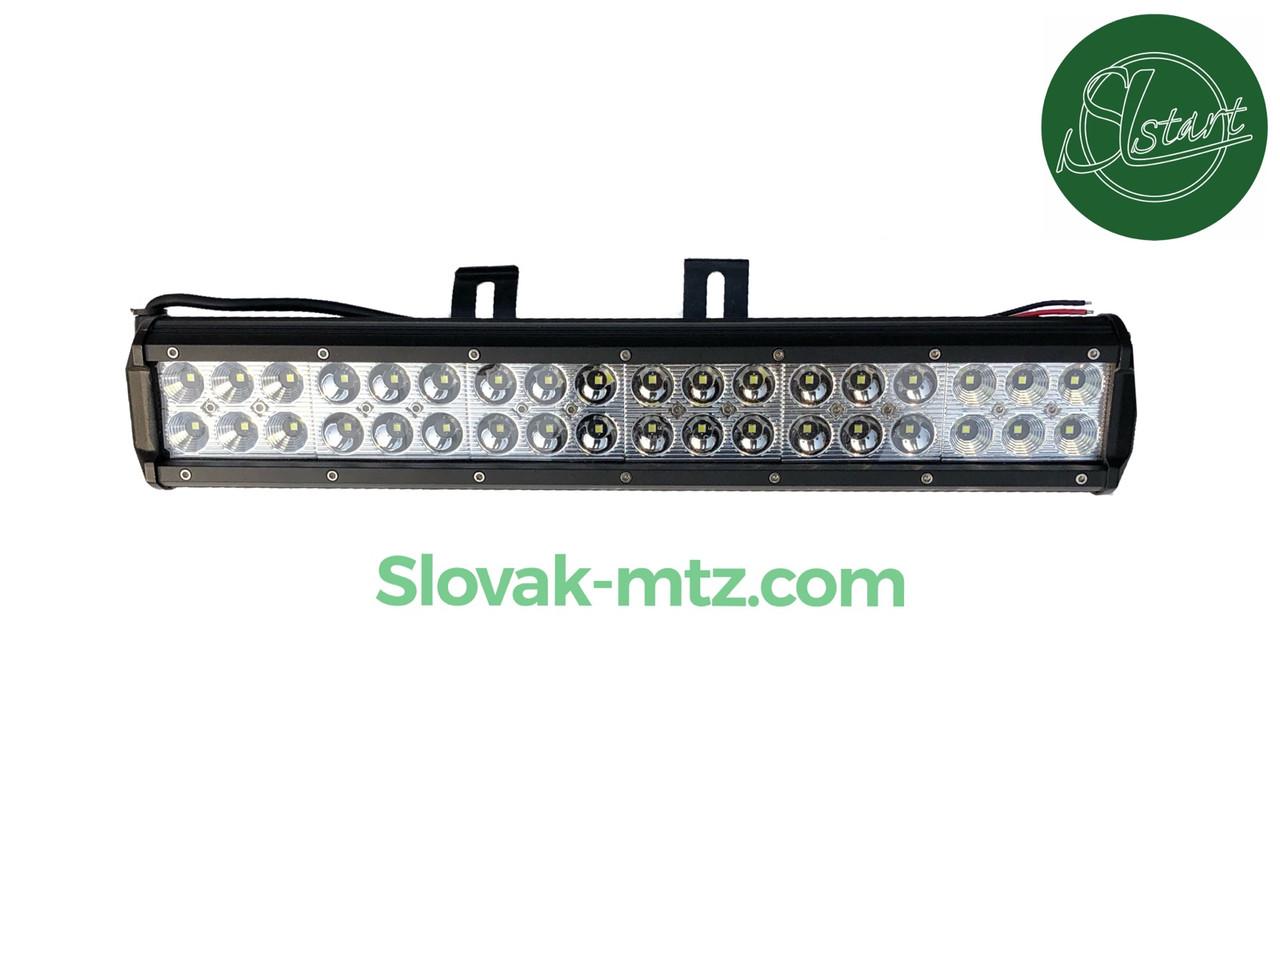 Светодиодная LED Балка (44см) 108Вт  (светодиоды 3w x36шт)